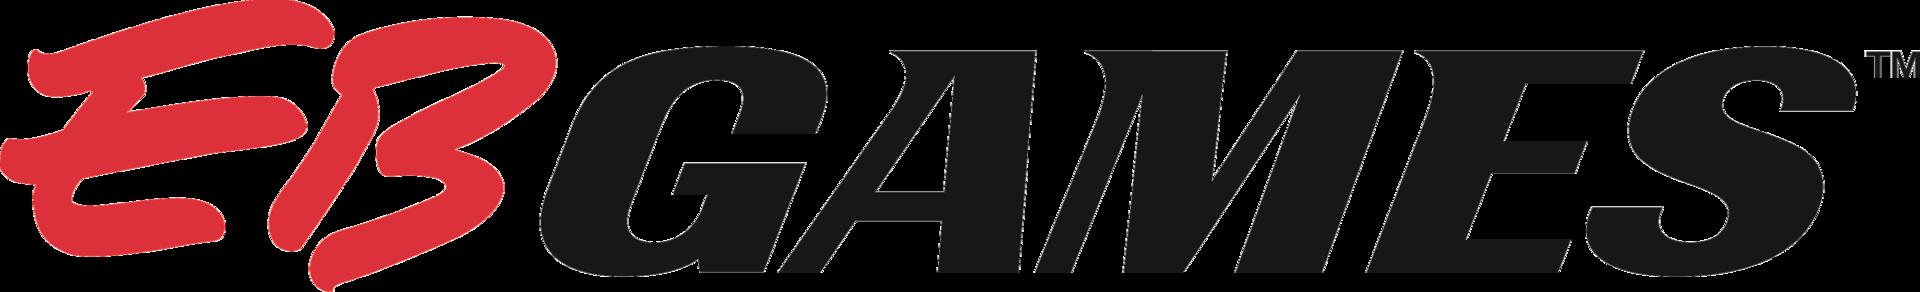 Eb Games Wikidata